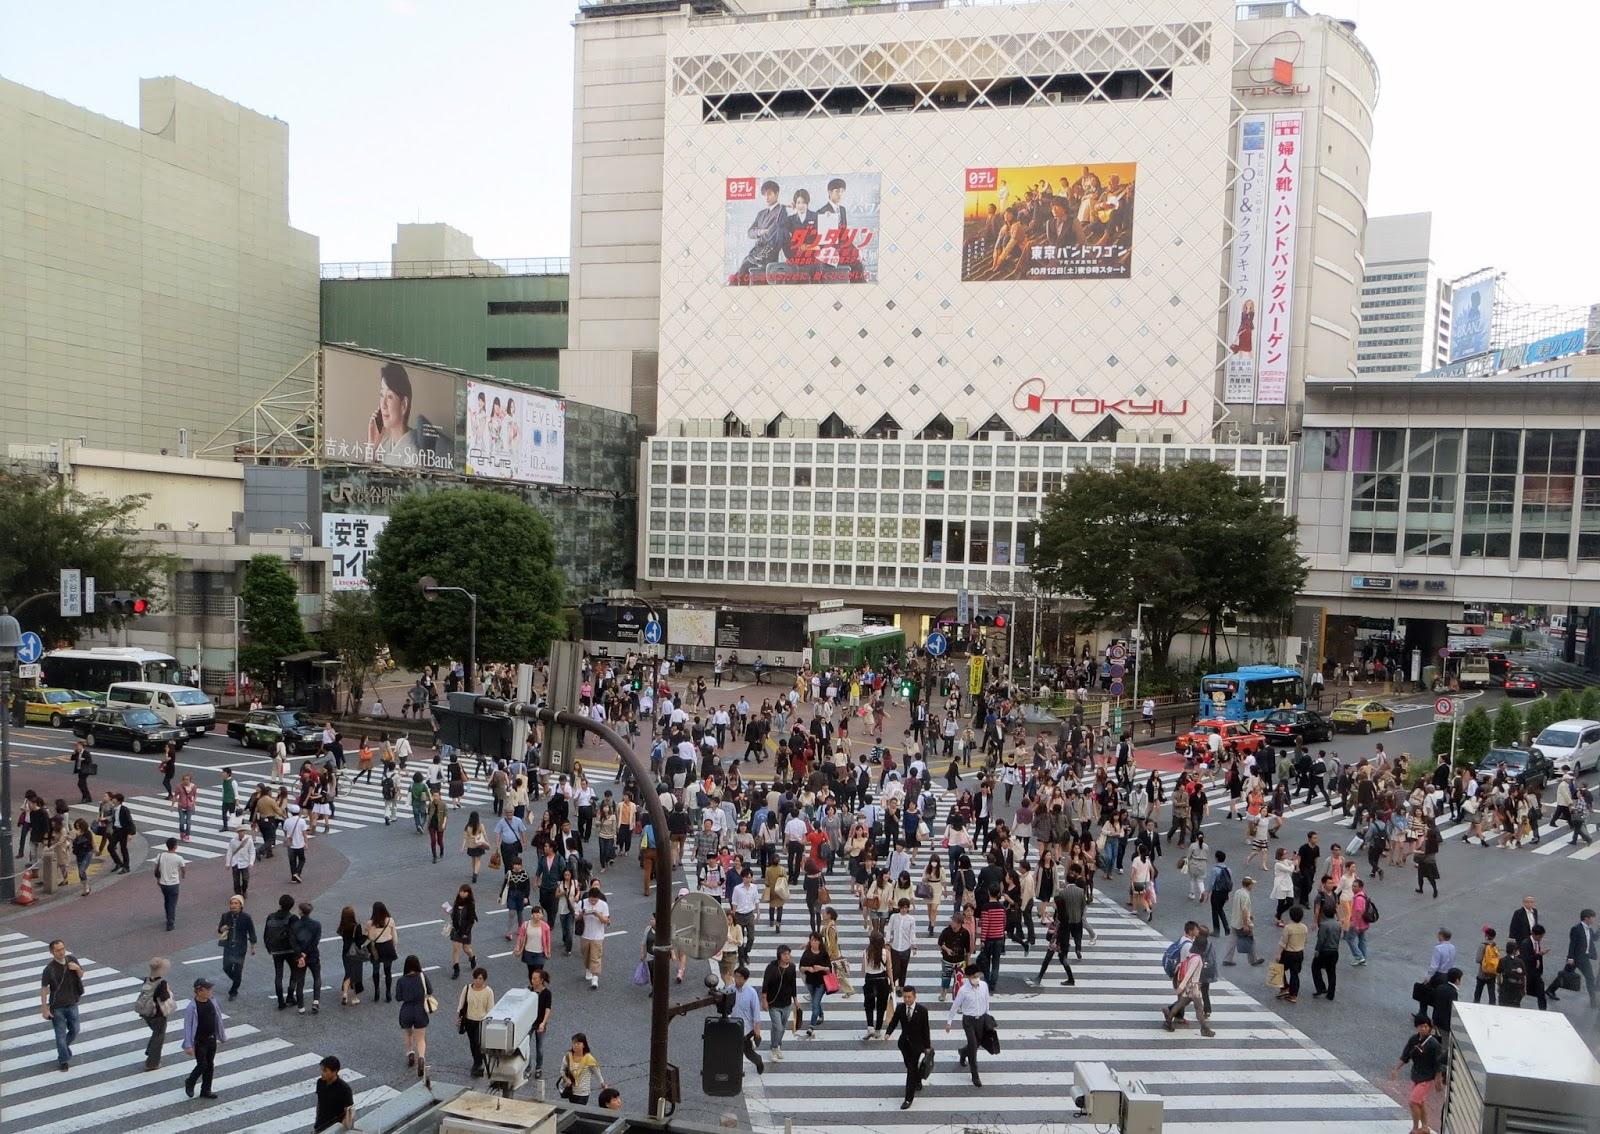 Shibuya crossing, shibuya scramble, starbucks, must do tokyo, Japan